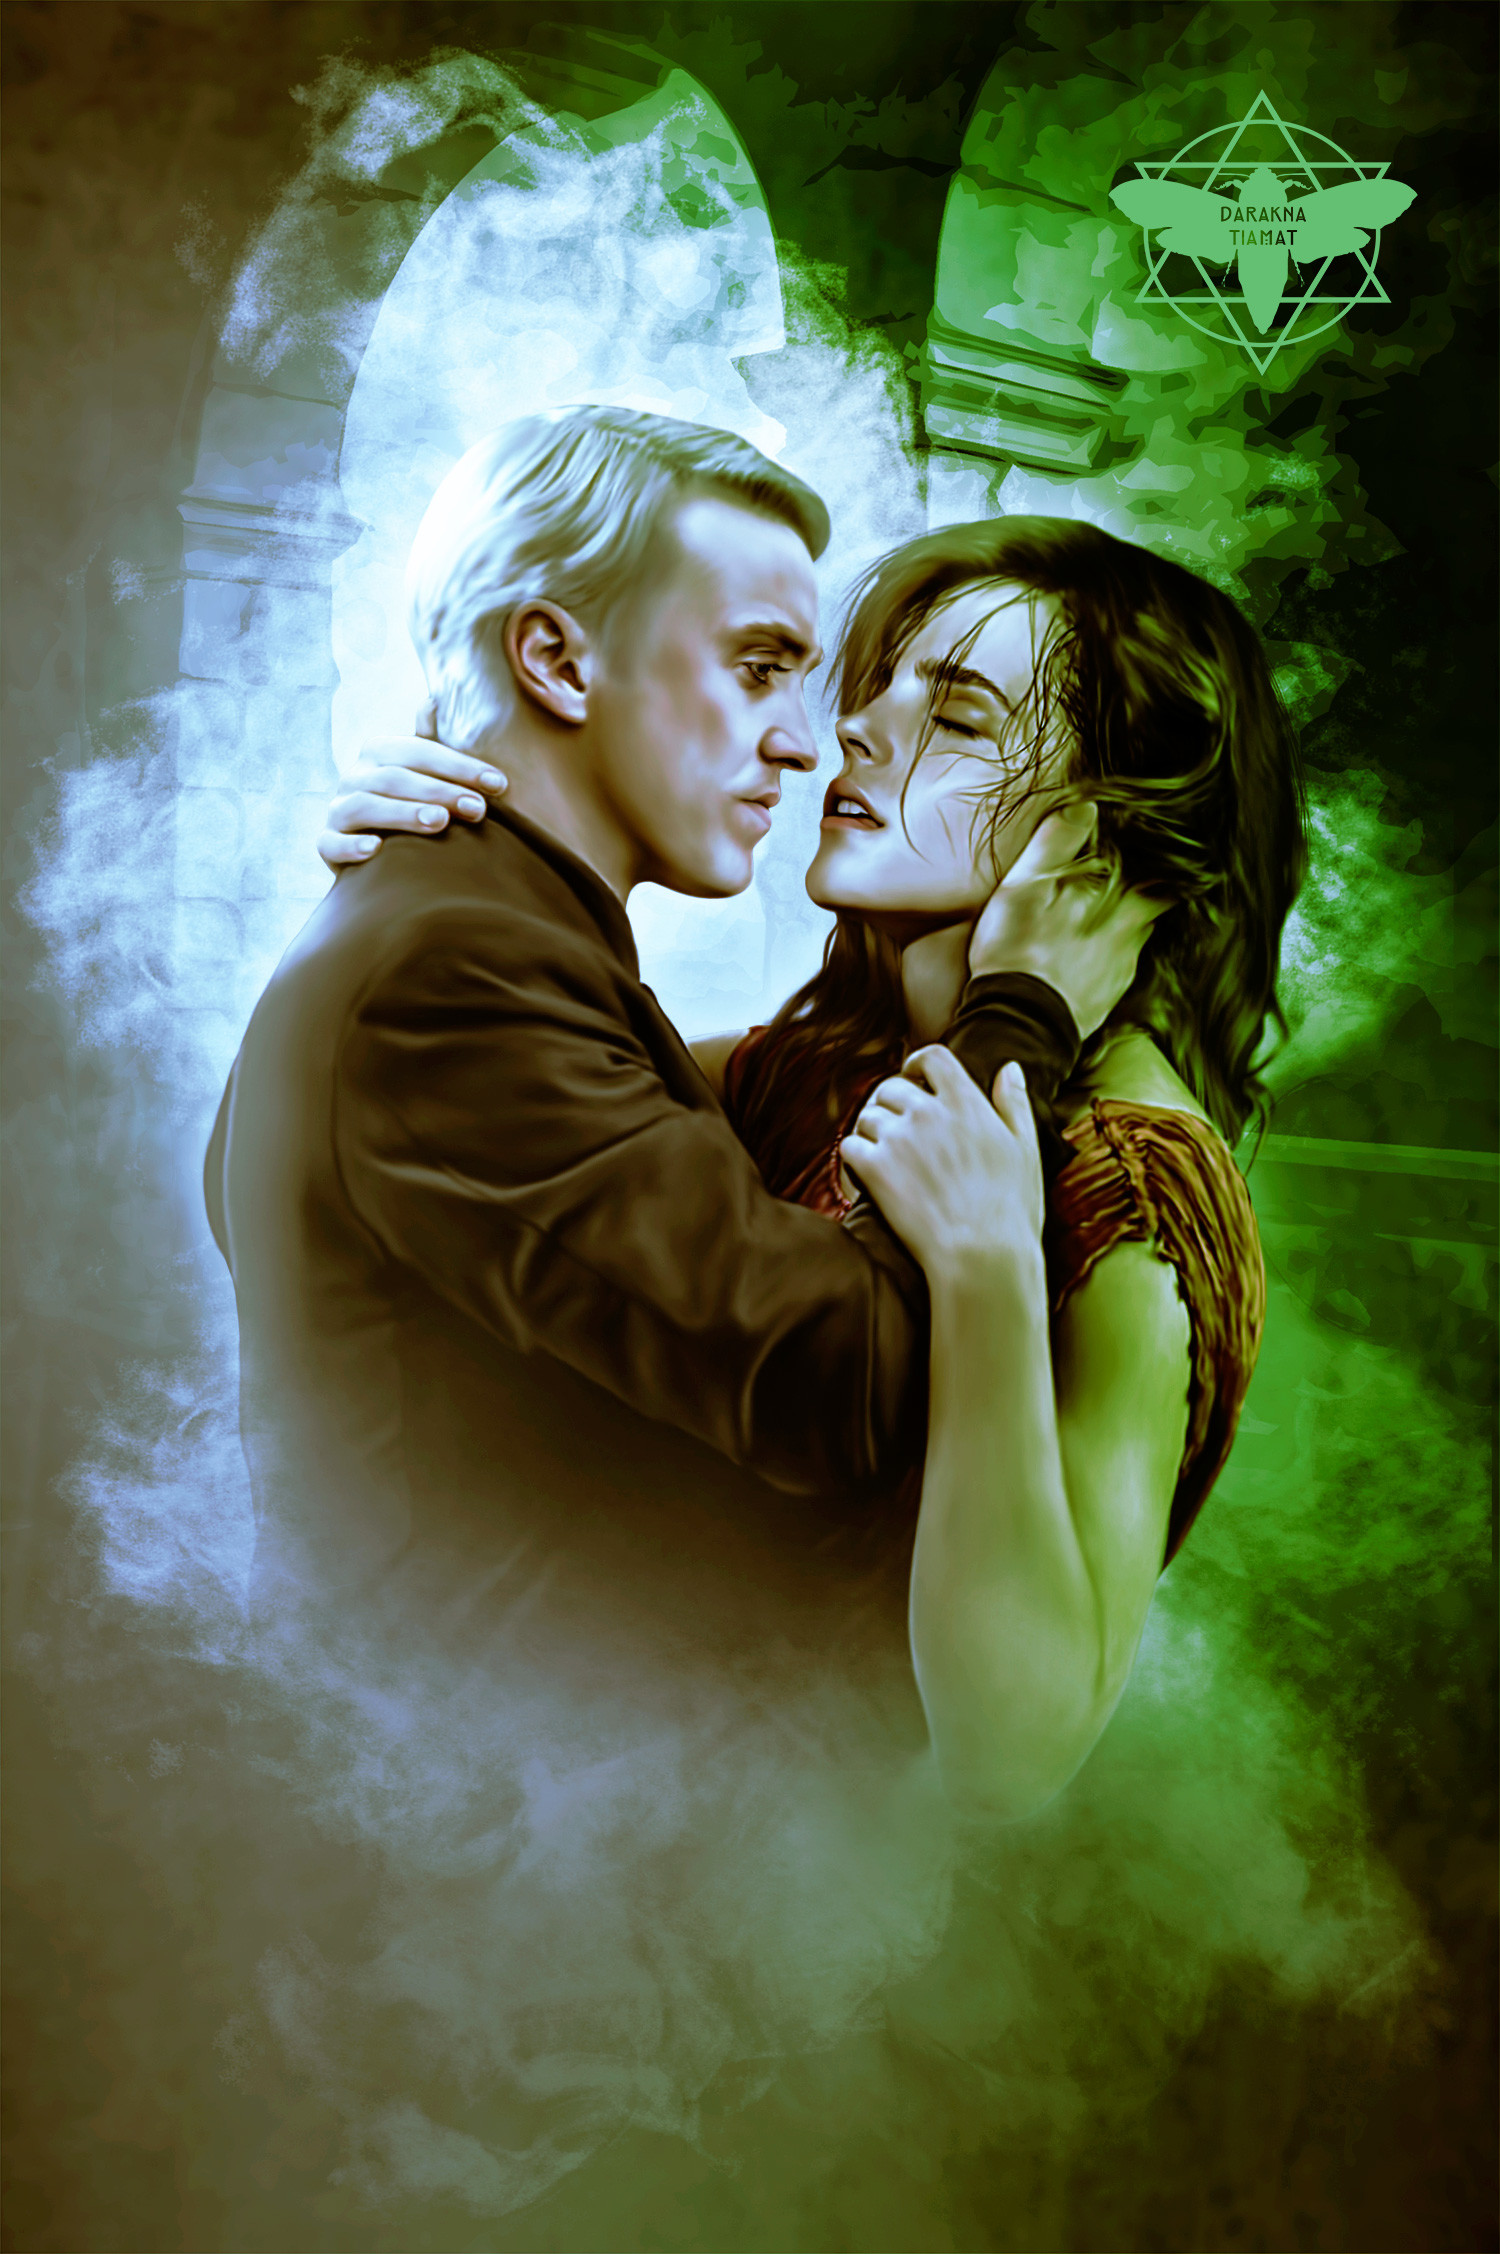 är Hermione dating Malfoy